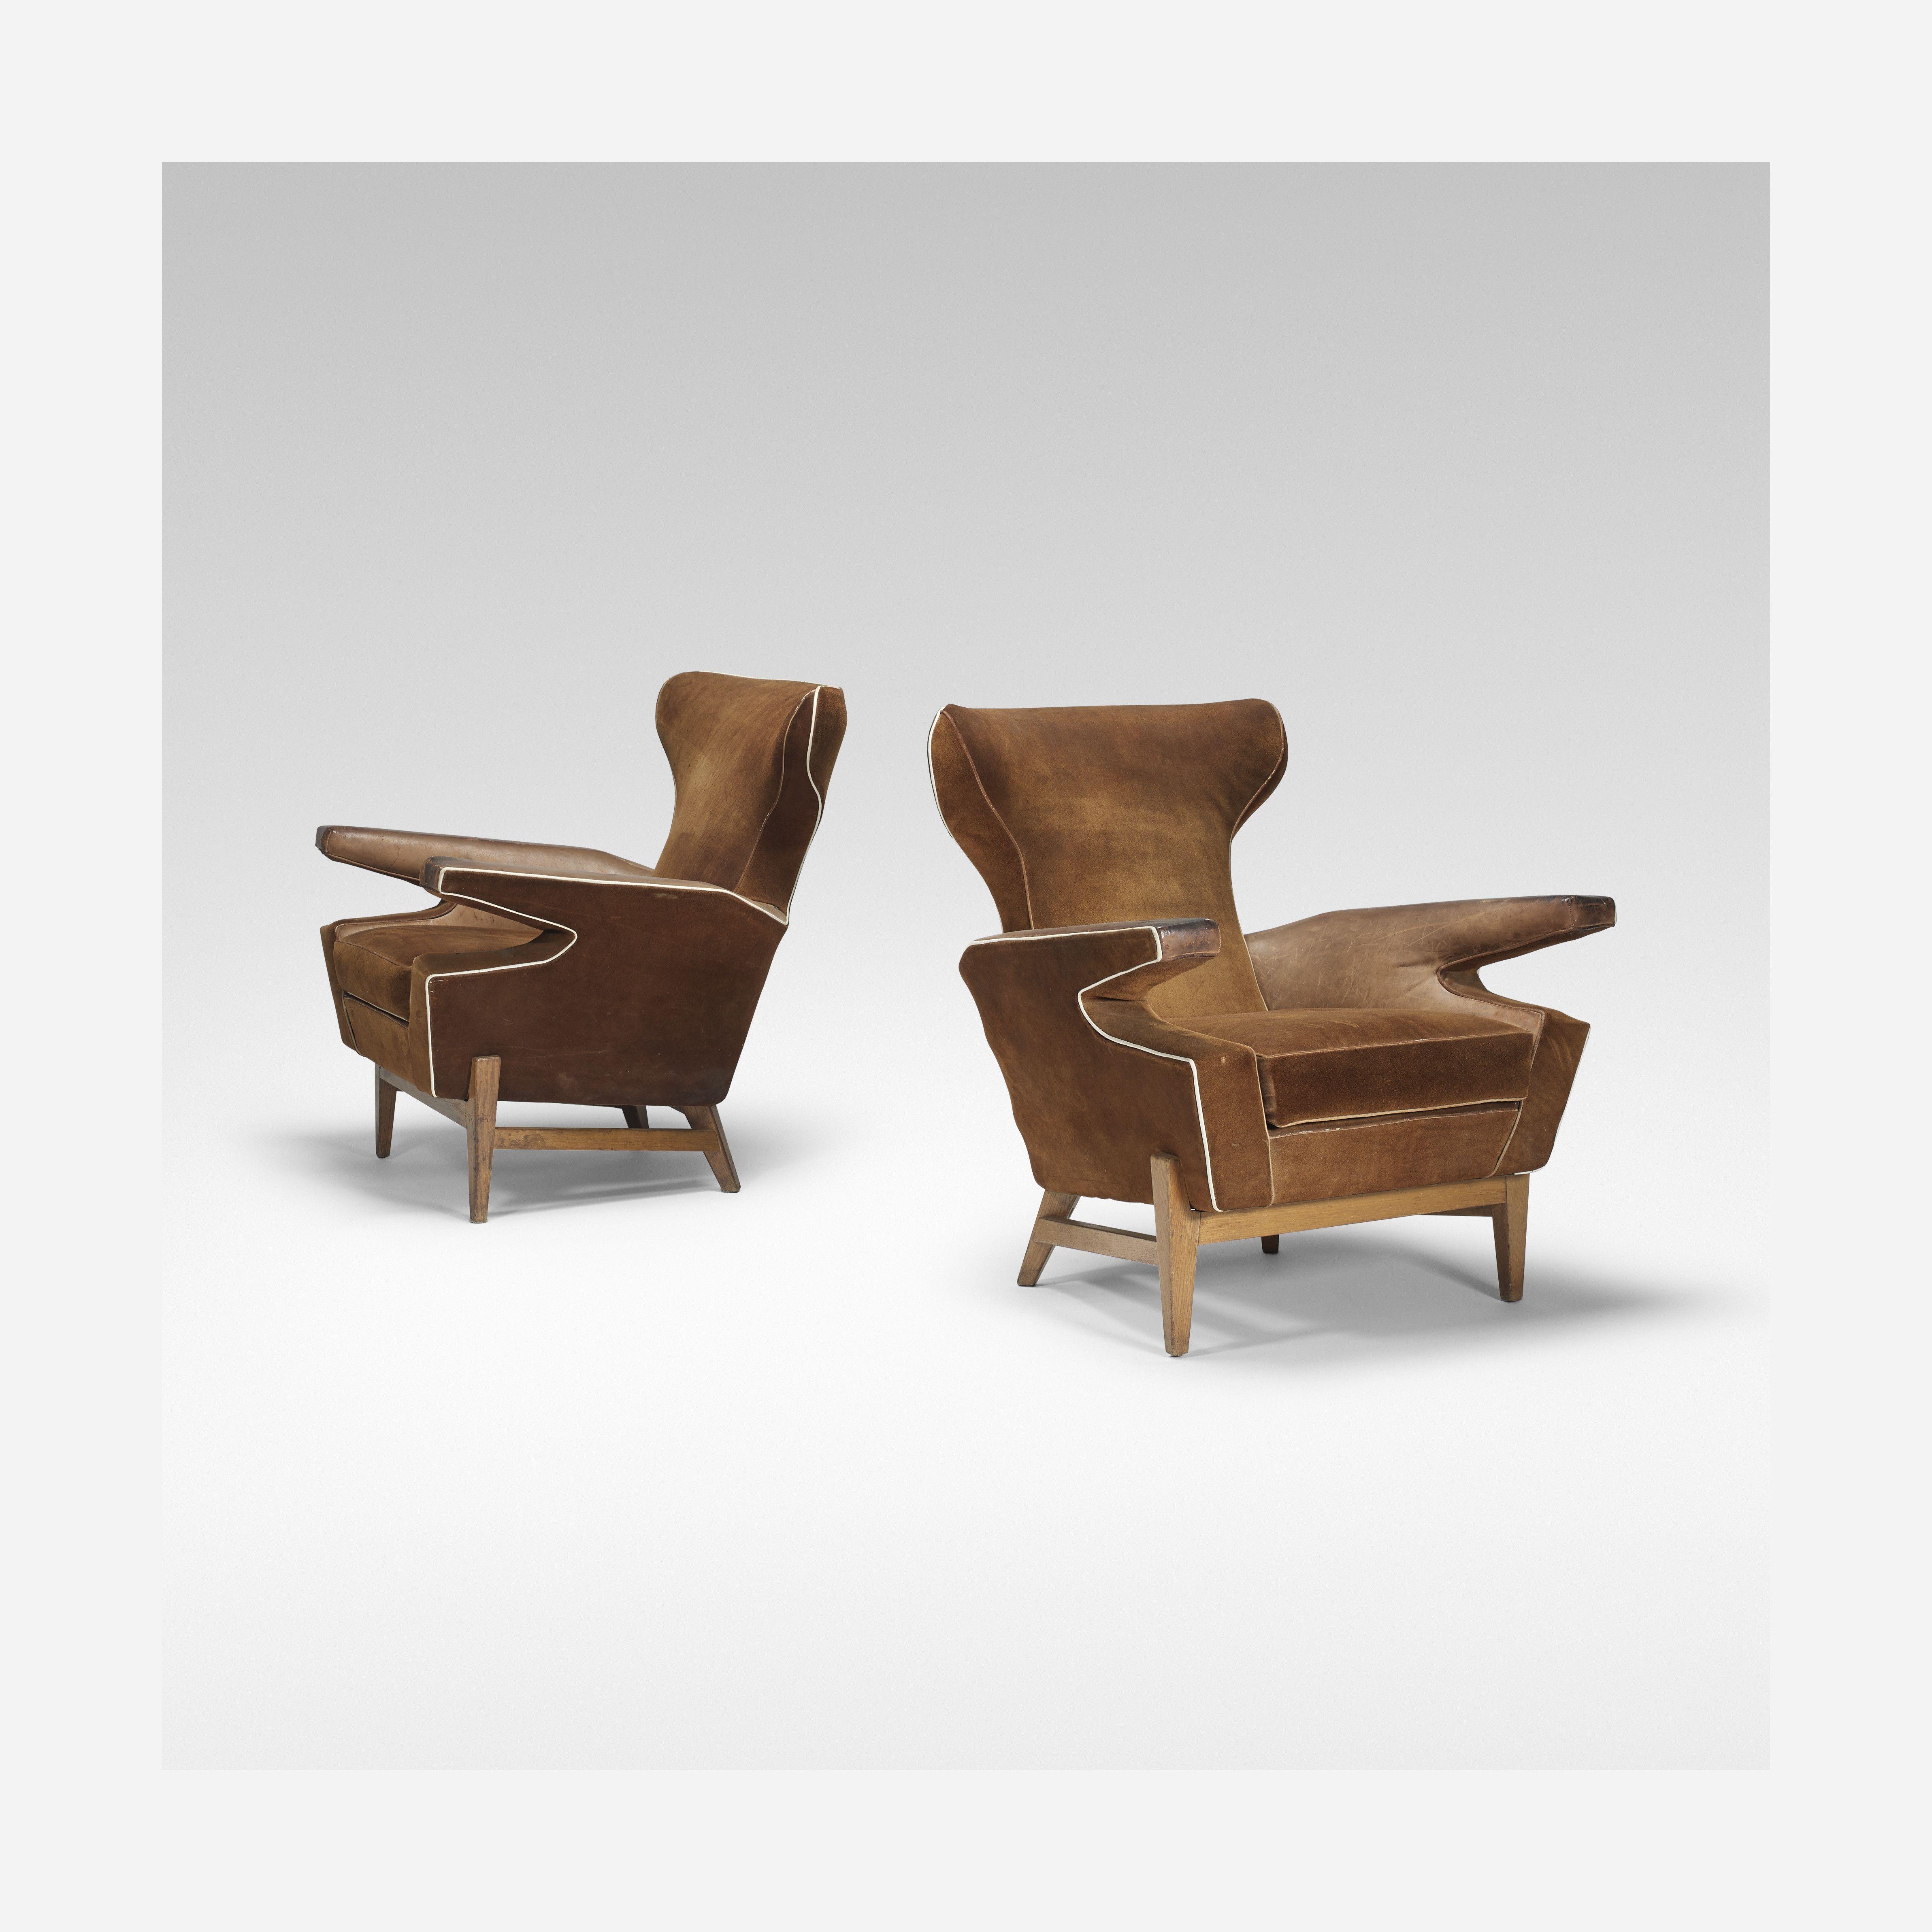 156: Danish / lounge chairs, pair < Blackman Cruz, 21 April 2015 ...